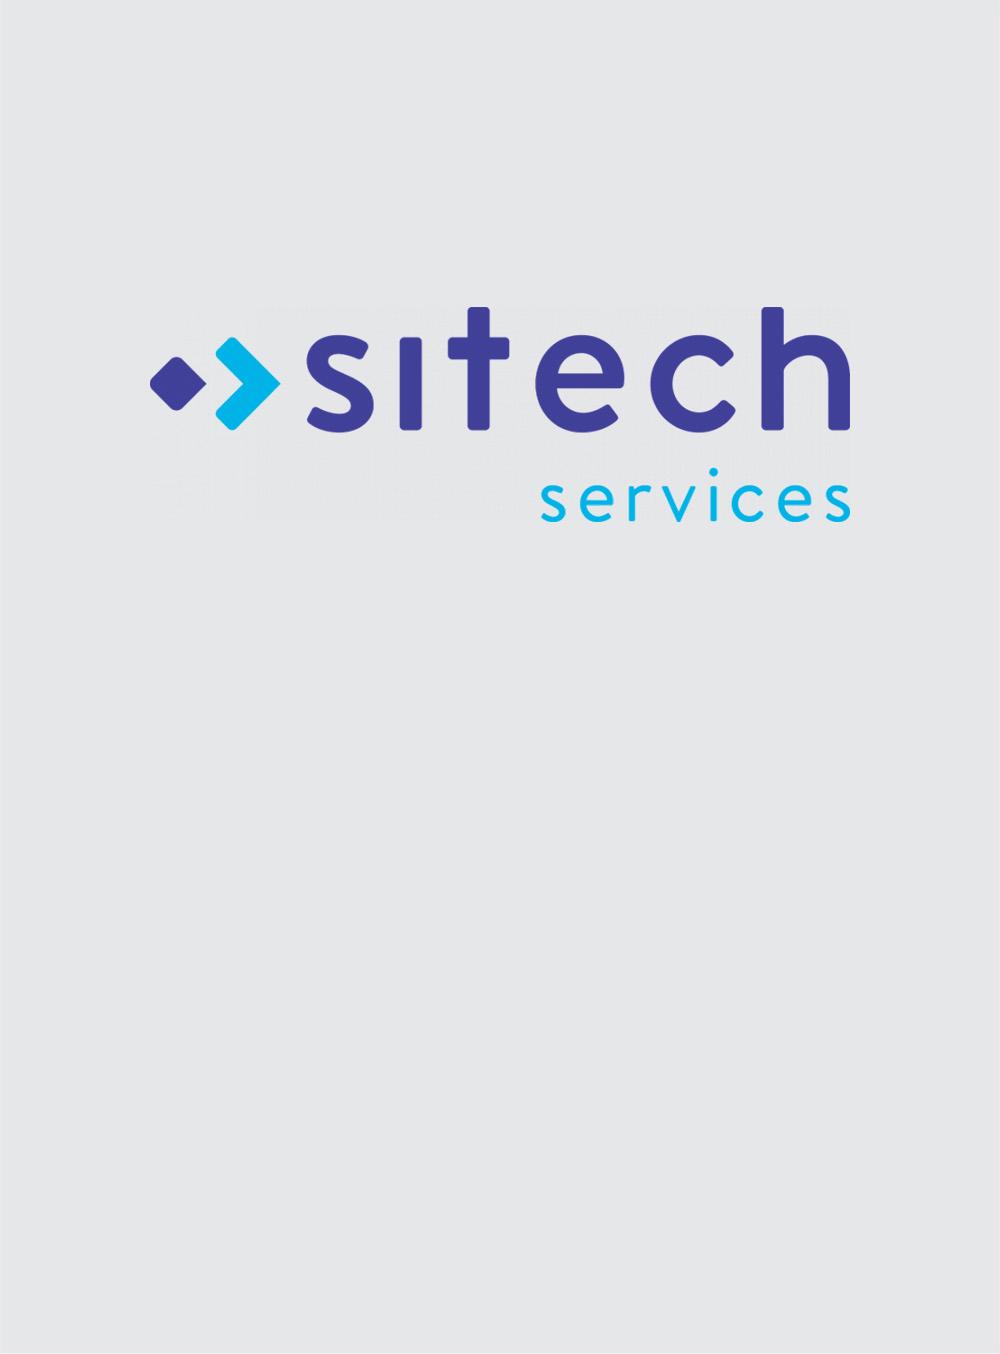 Logo Sitech